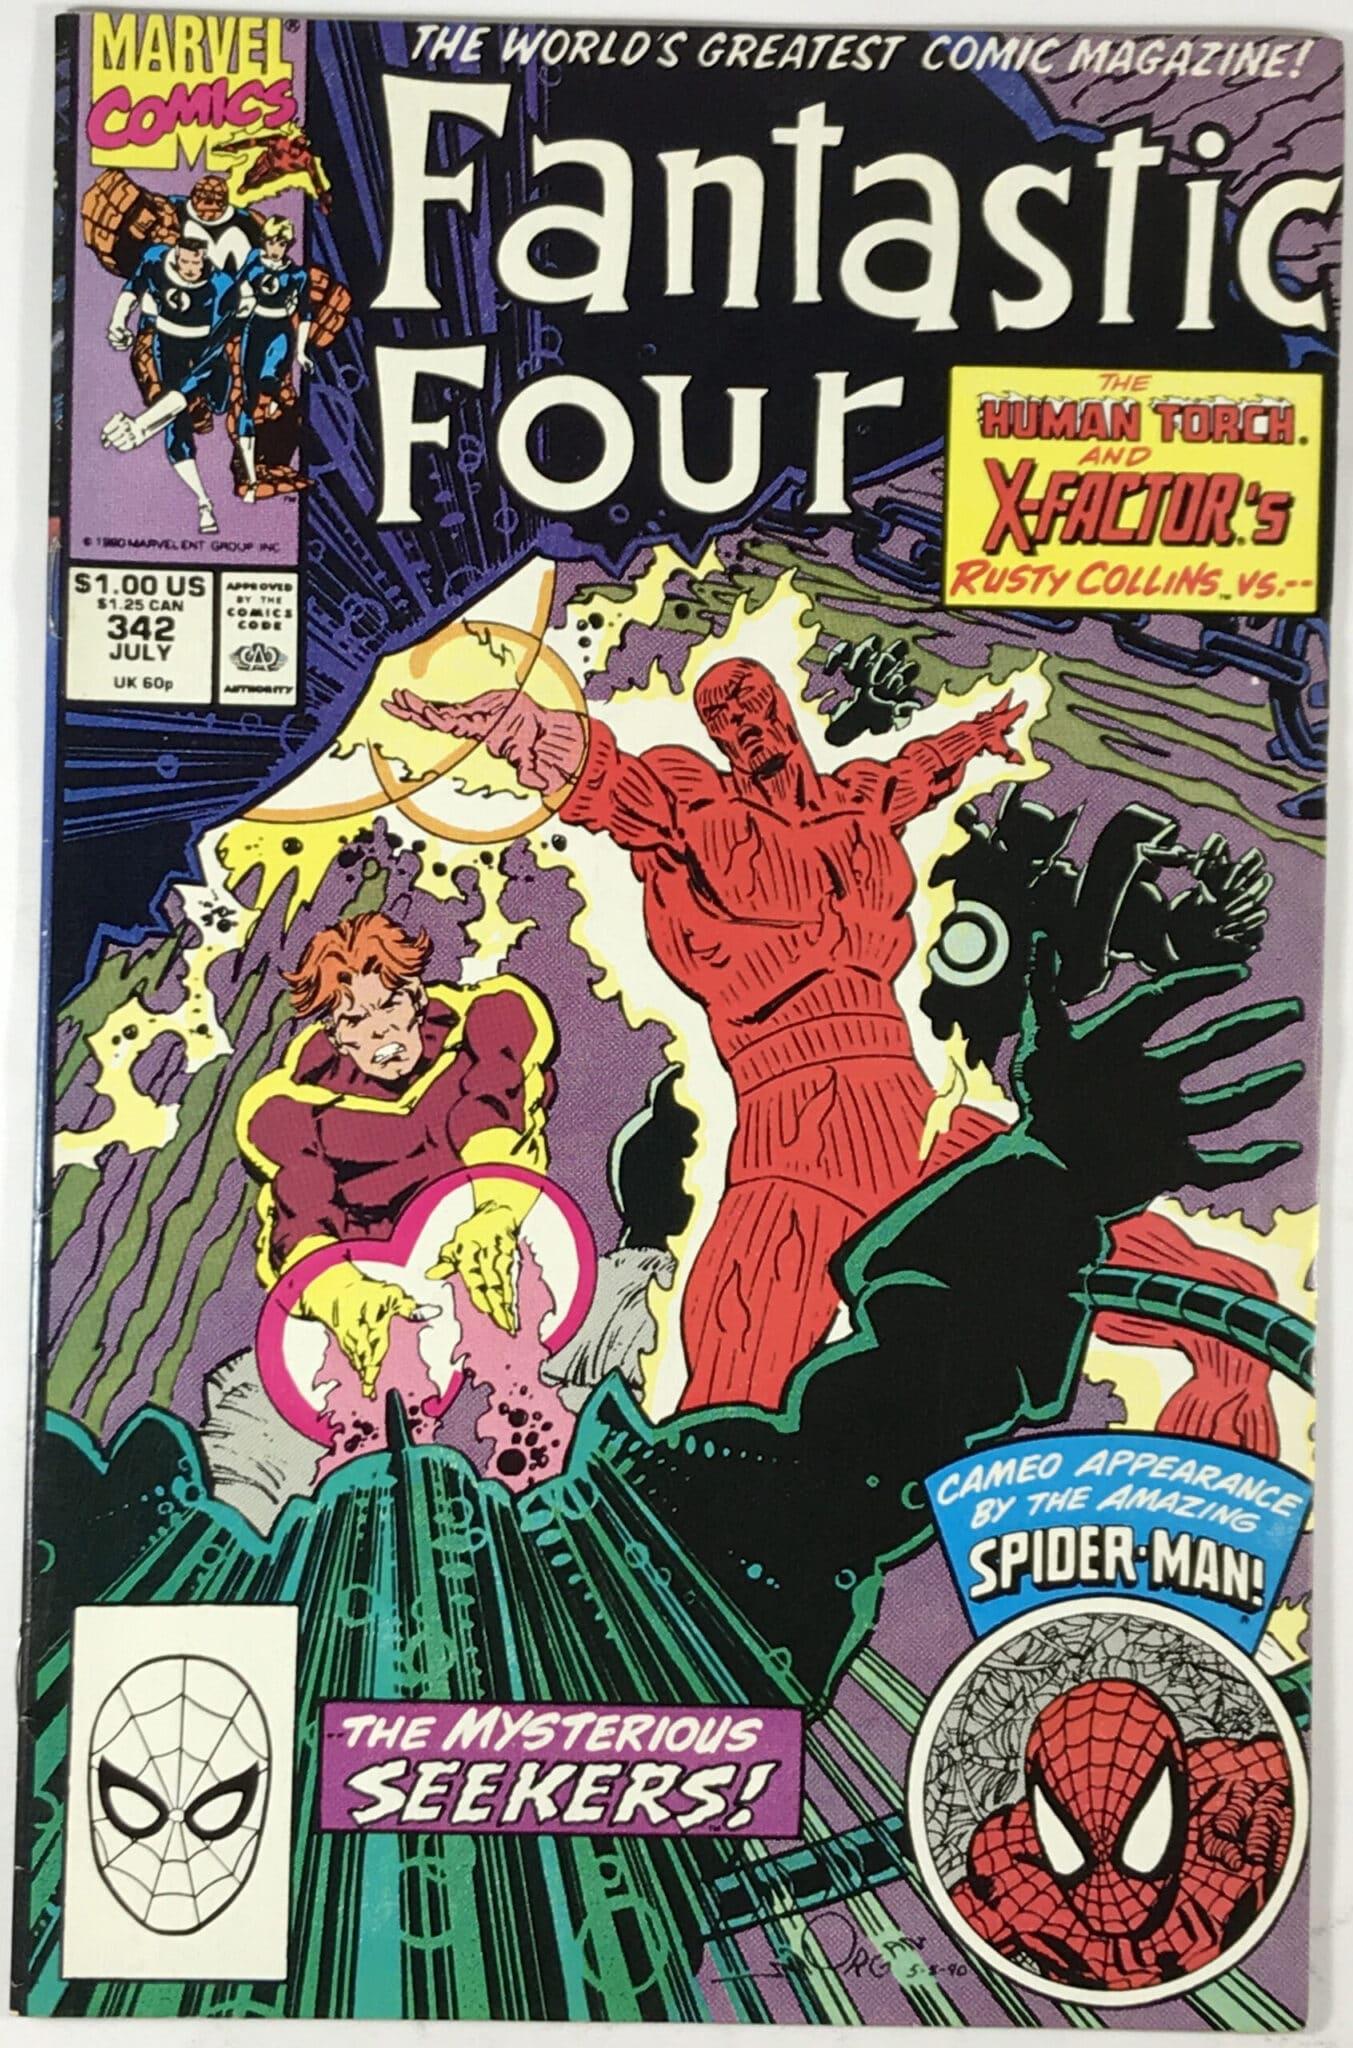 Fantastic Four (1961-1998) #342 Comic Book - Very Fine